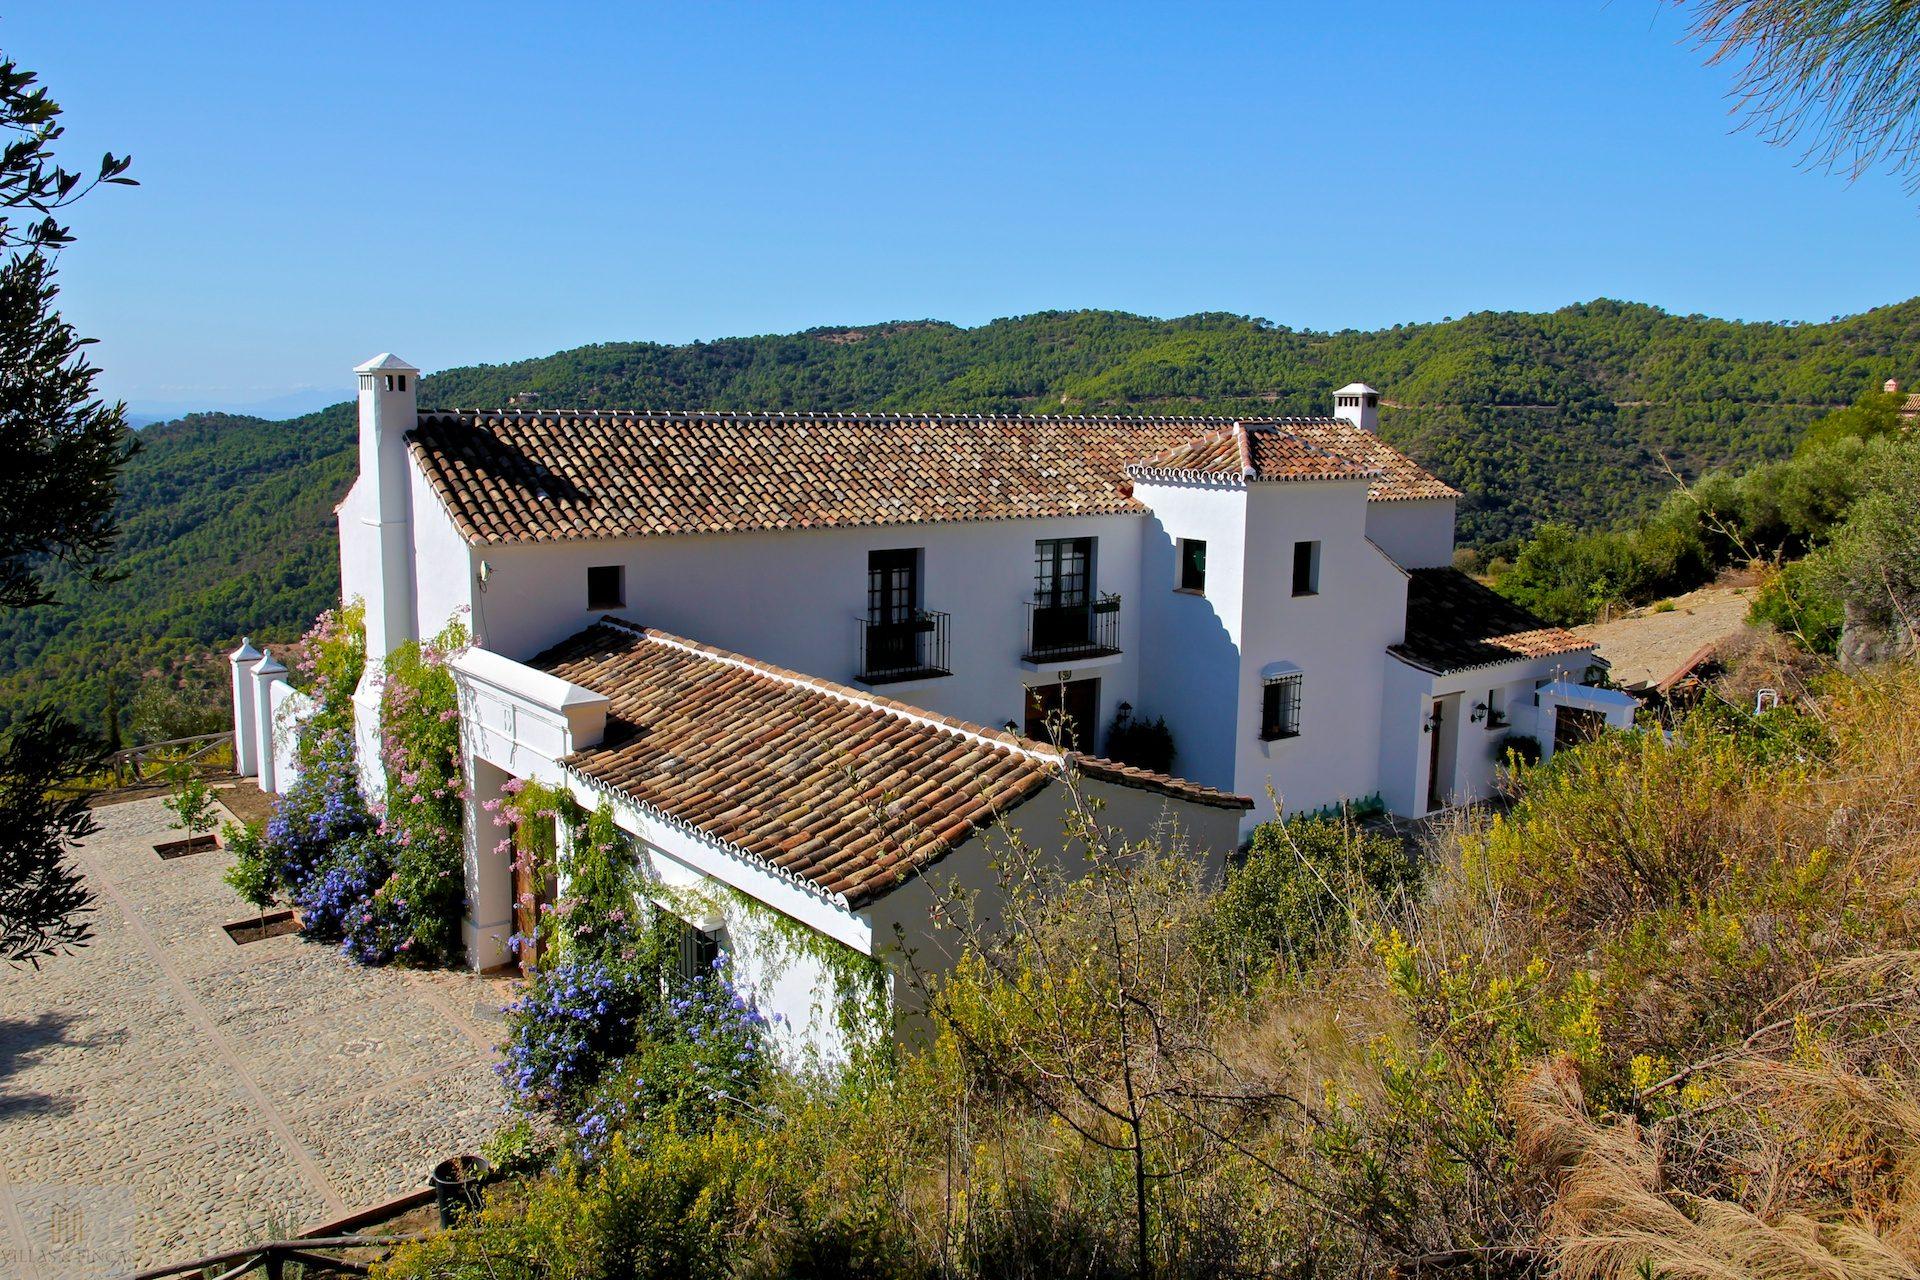 11 Luxury Country house Gaucin for sale